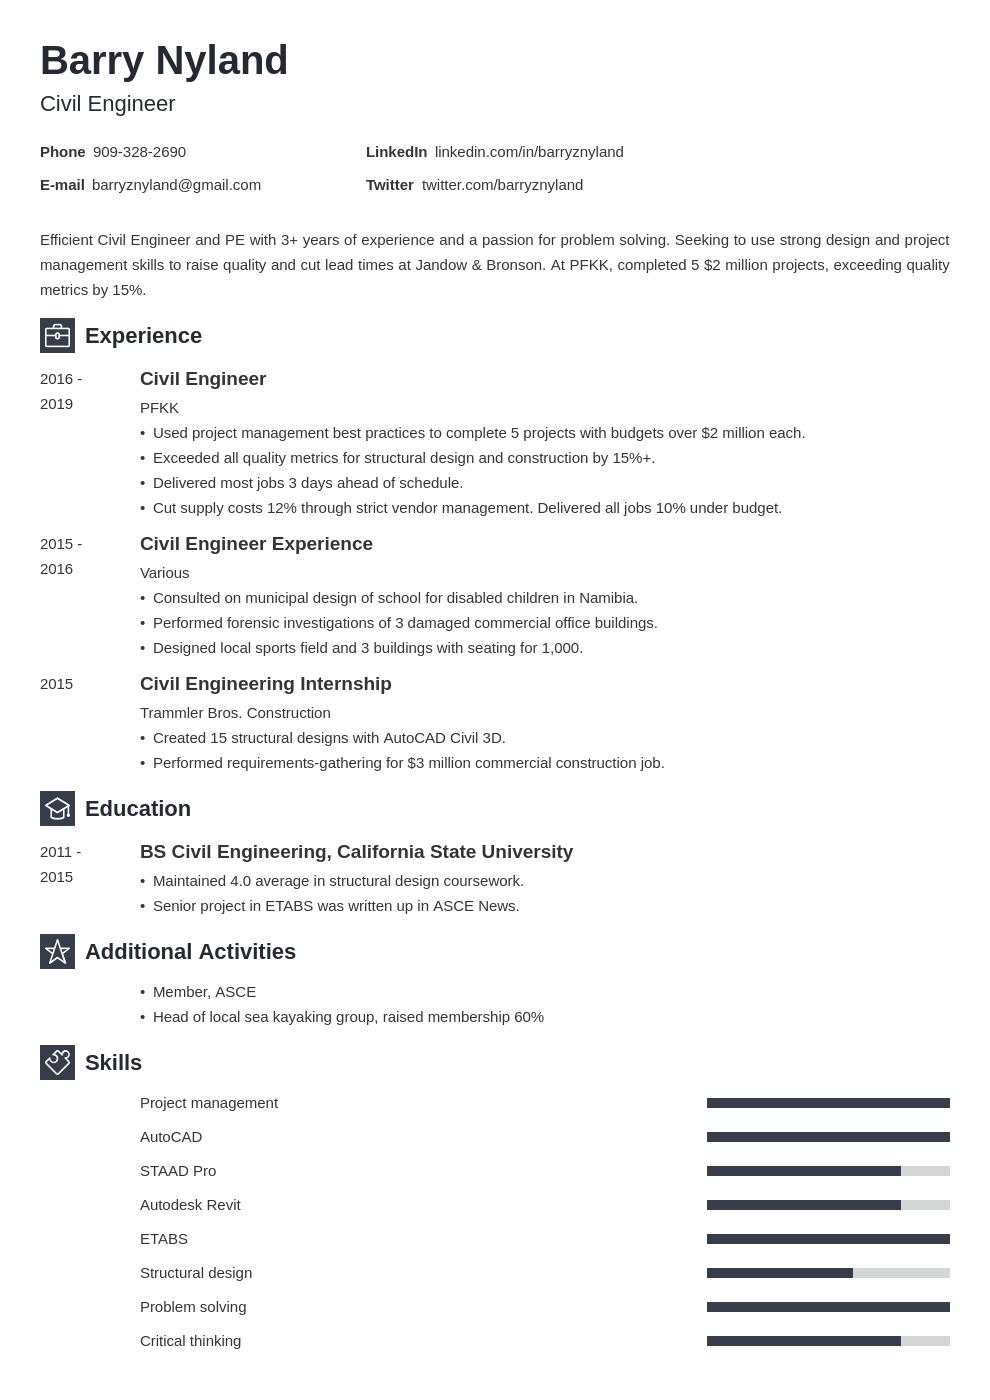 civil engineer template newcast uk